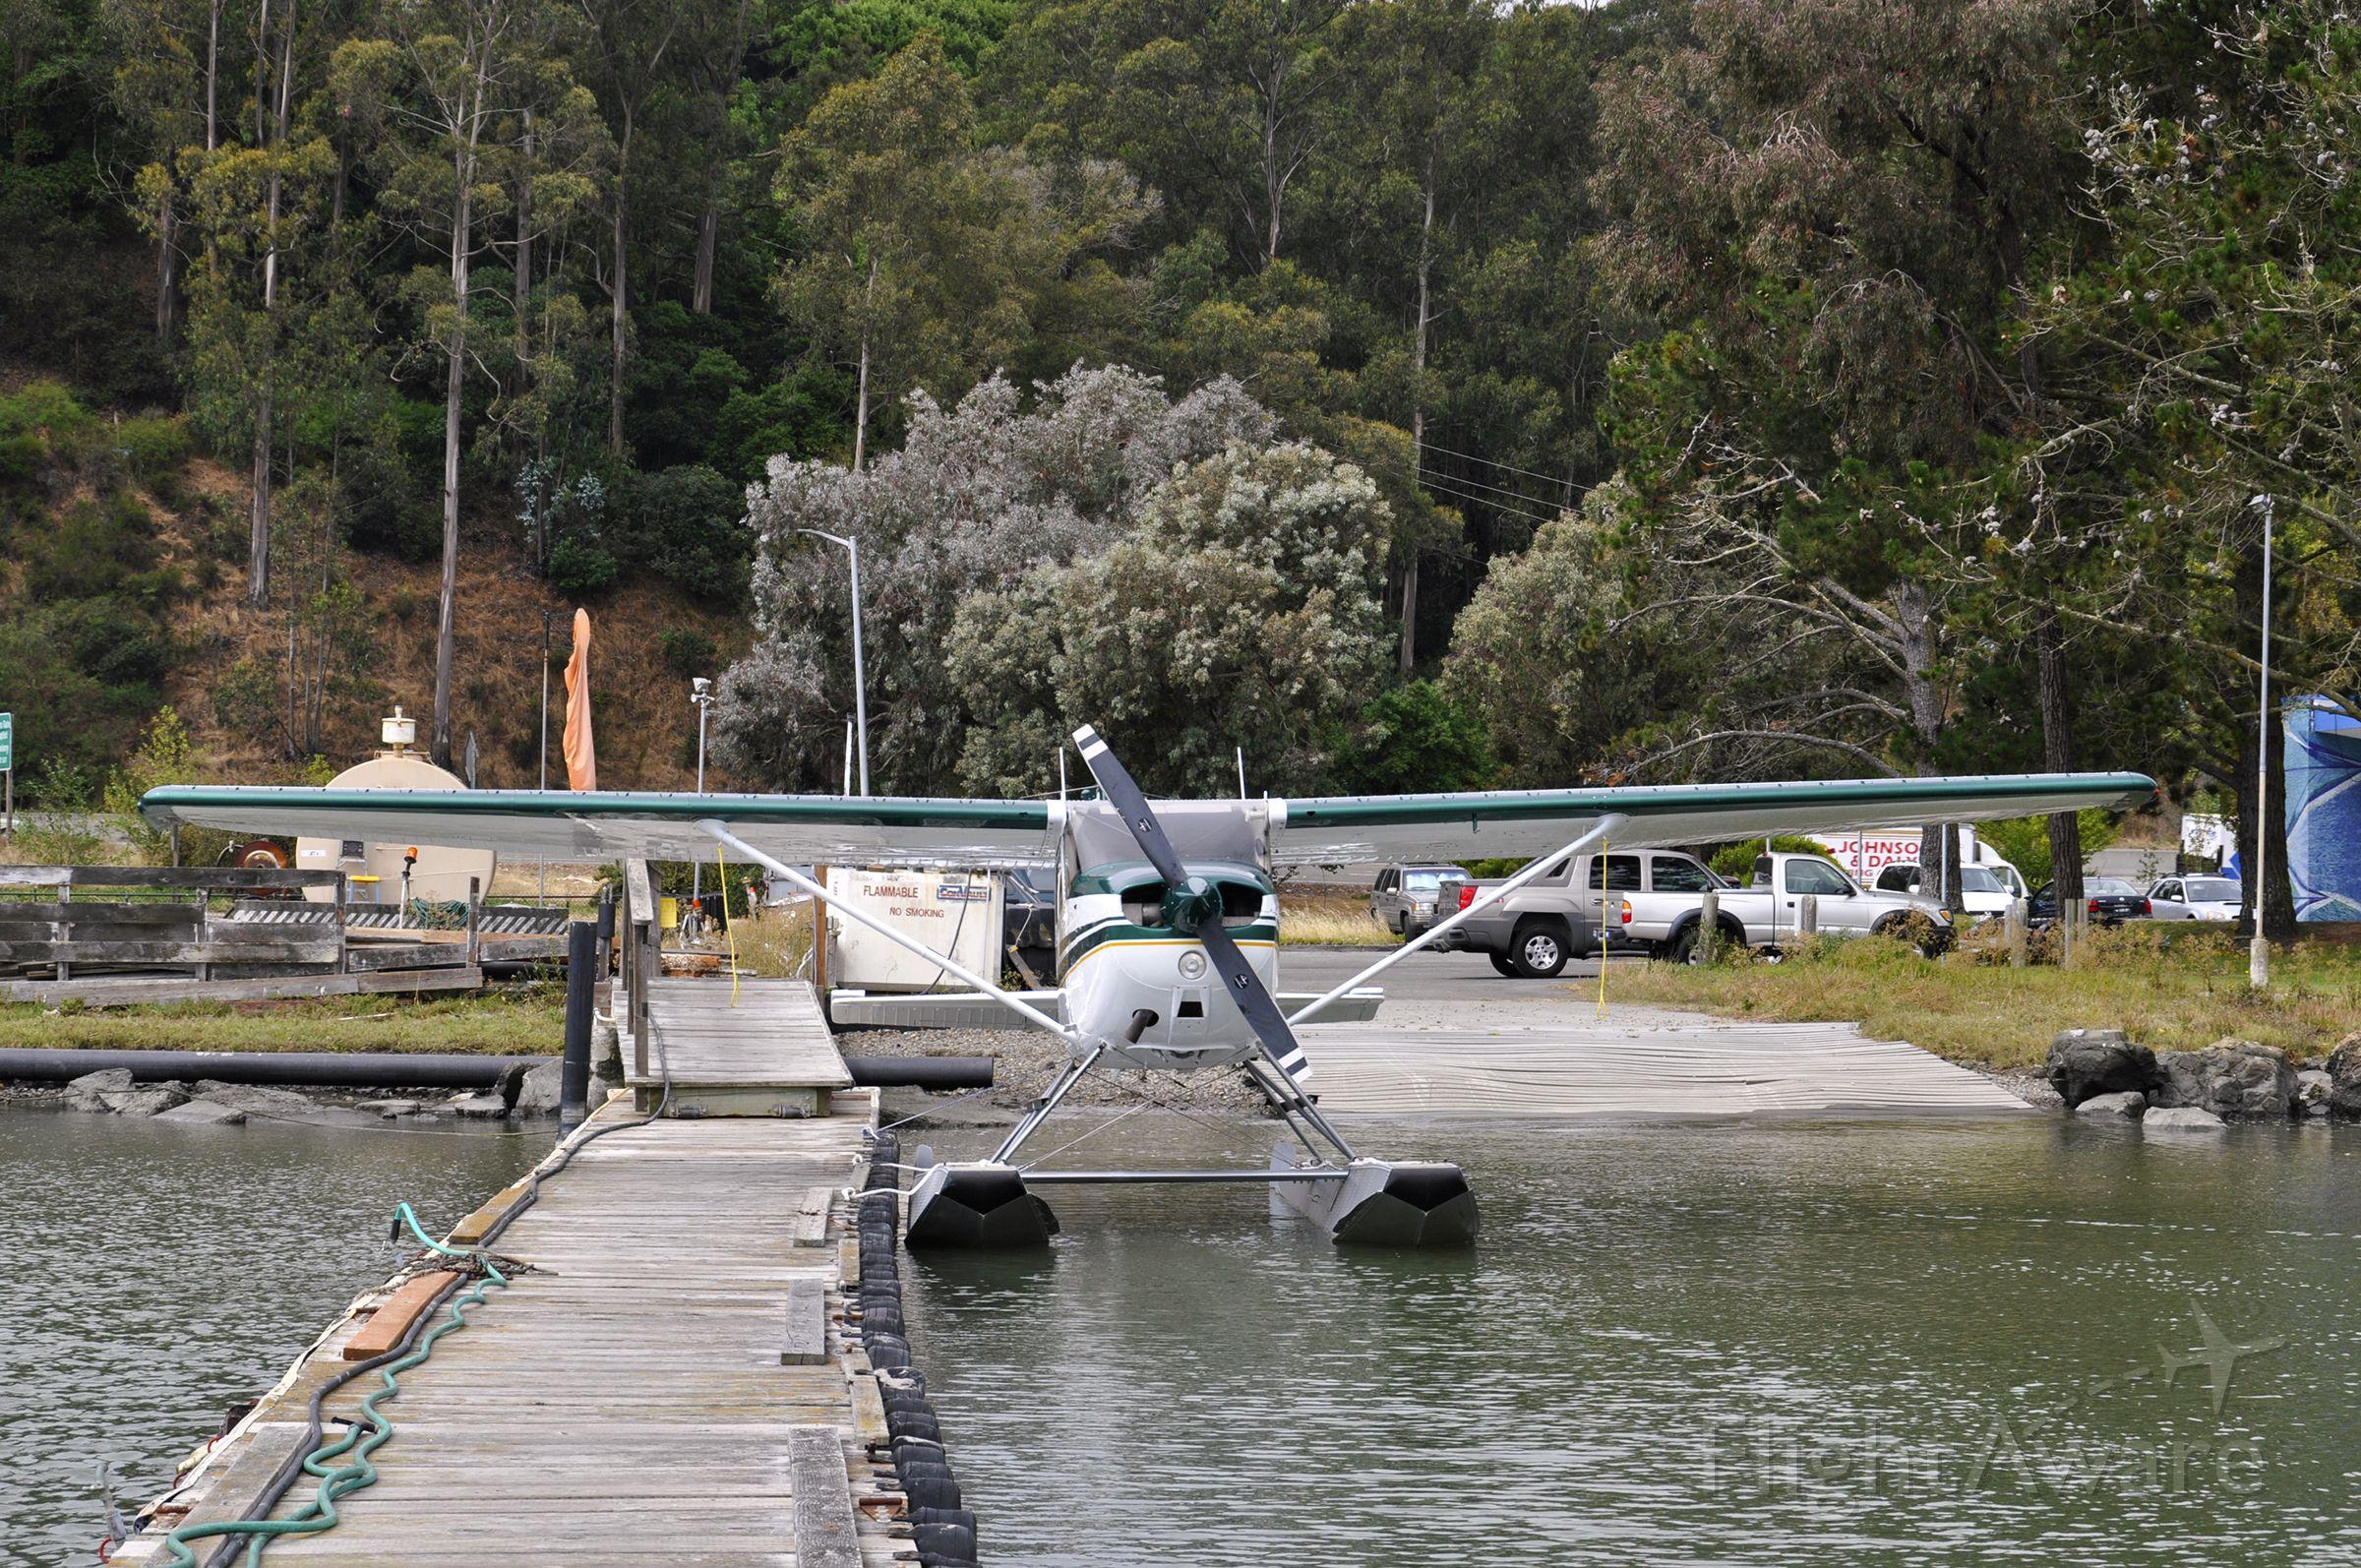 Cessna Skyhawk (N461BD) - San Francisco Seaplane Tours Inc - Cessna 172N Skyhawk 100 N461BD in Sausalito